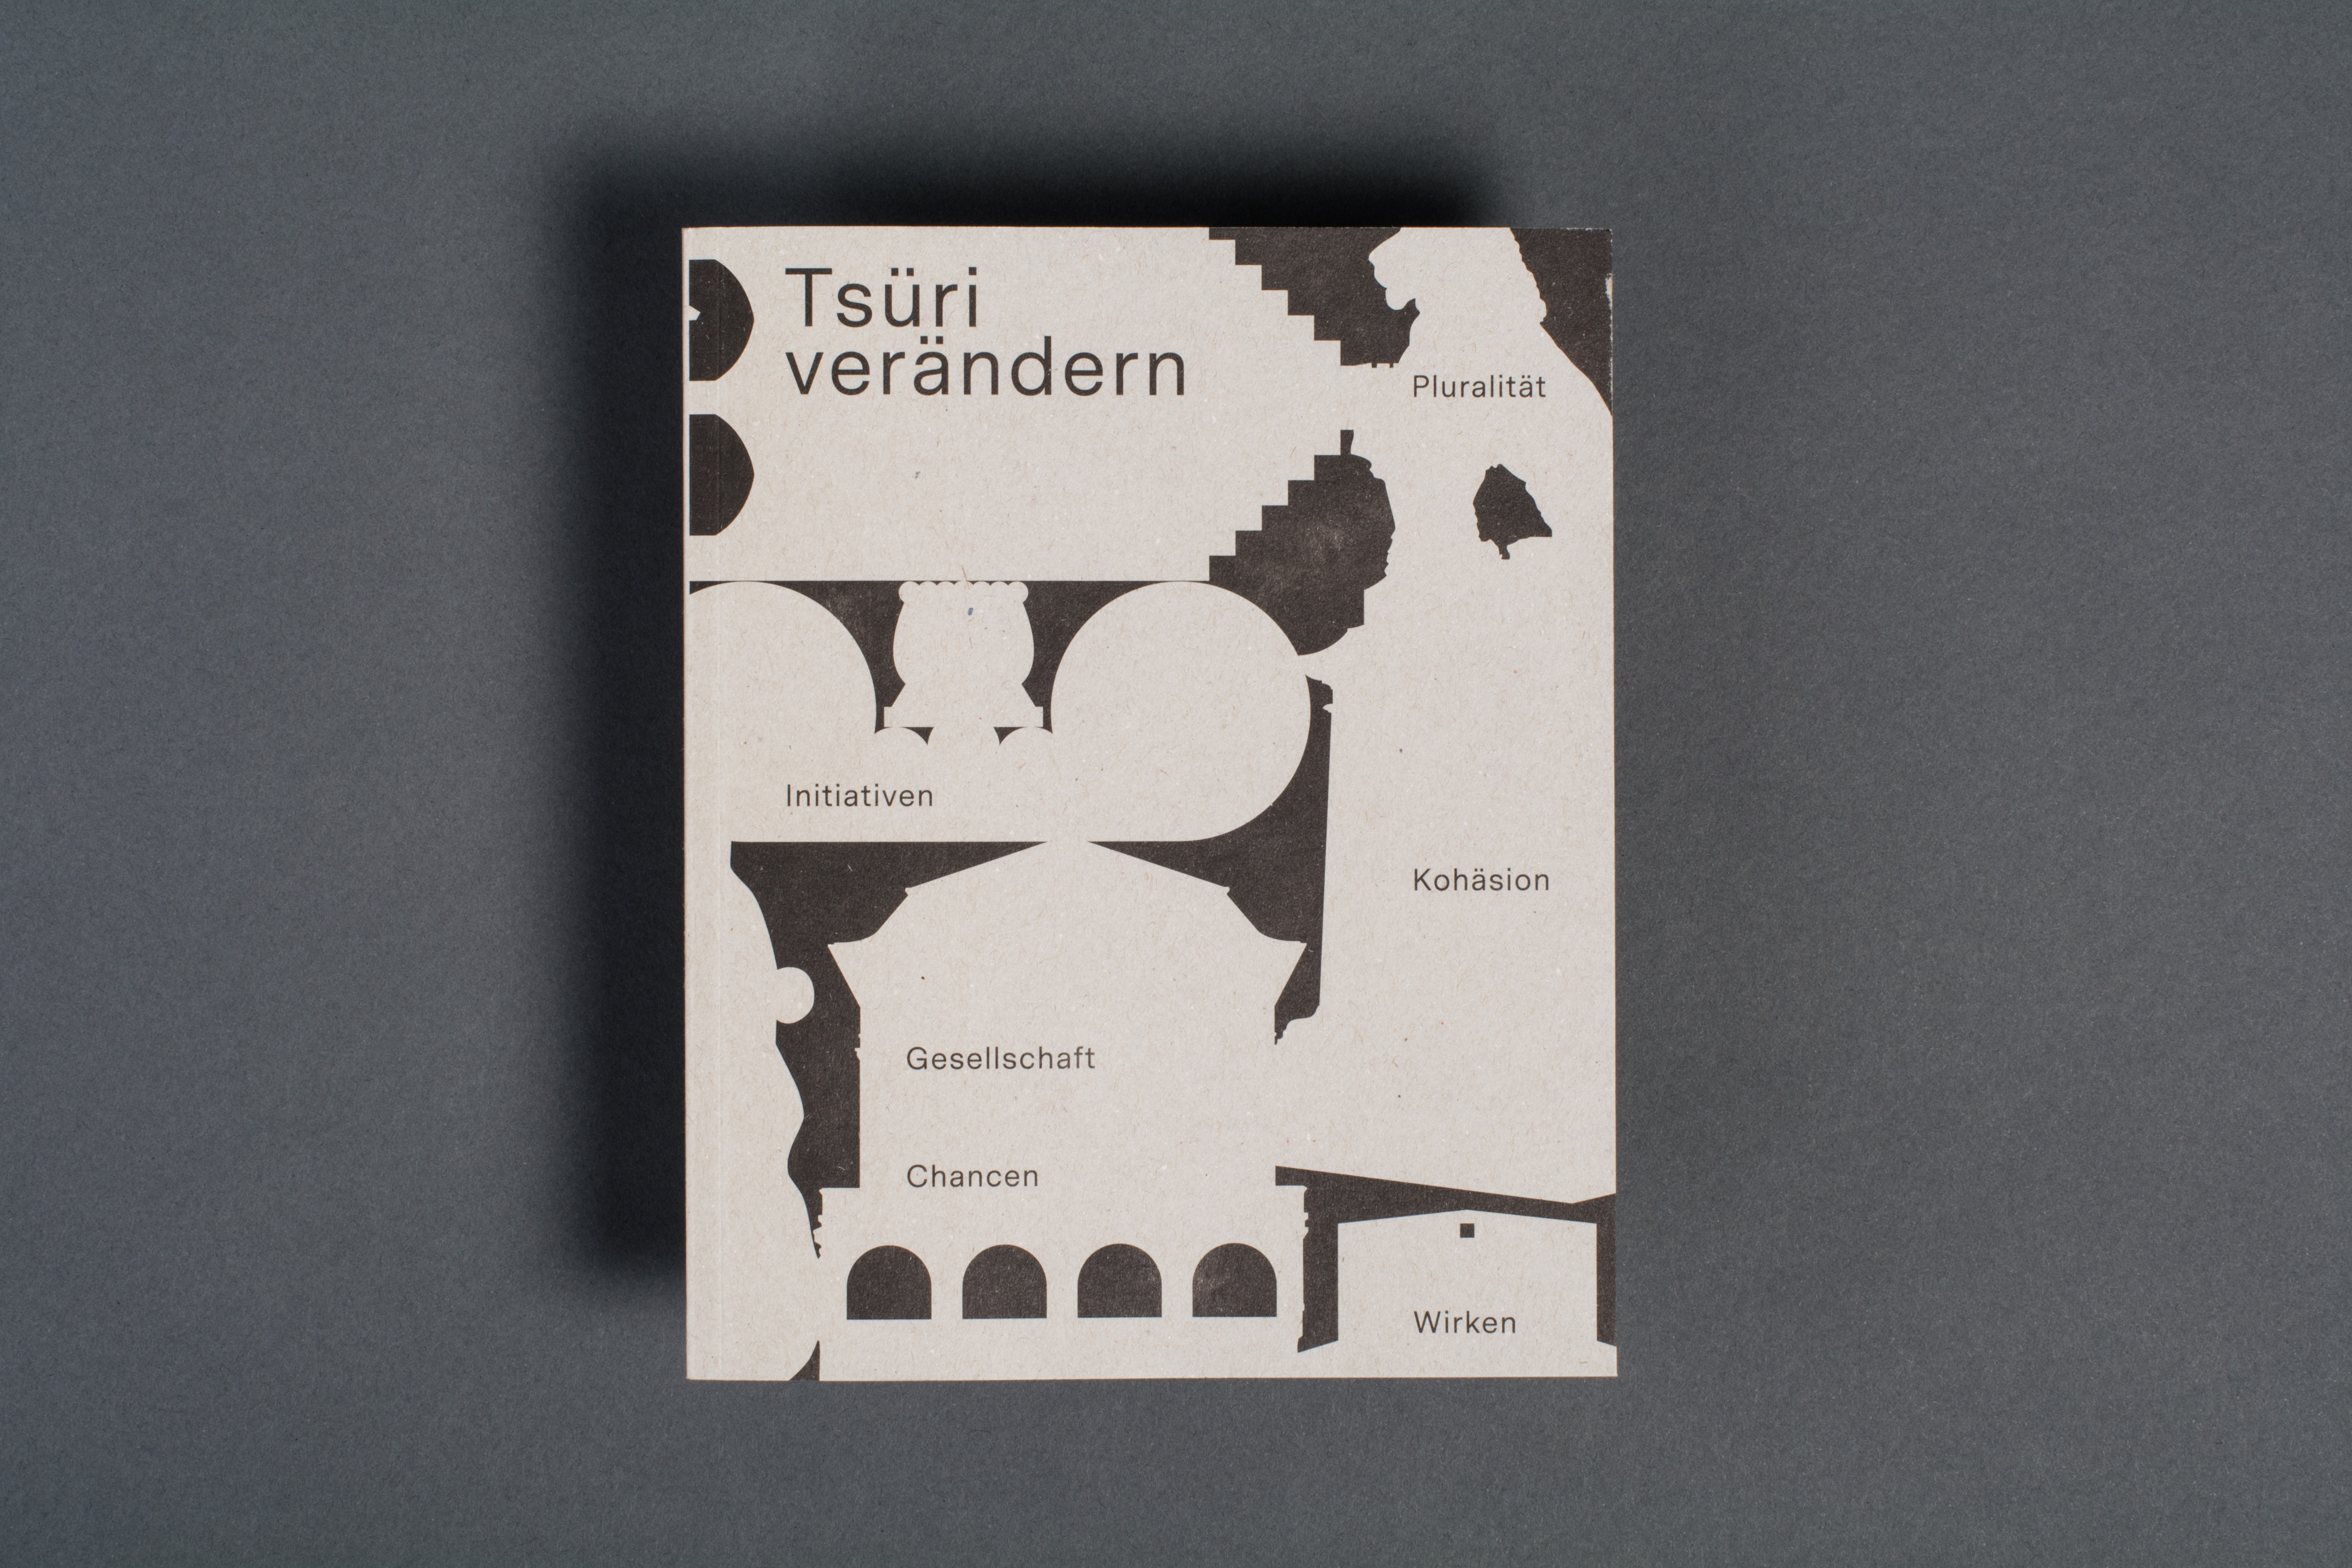 tsueri_veraendern-1